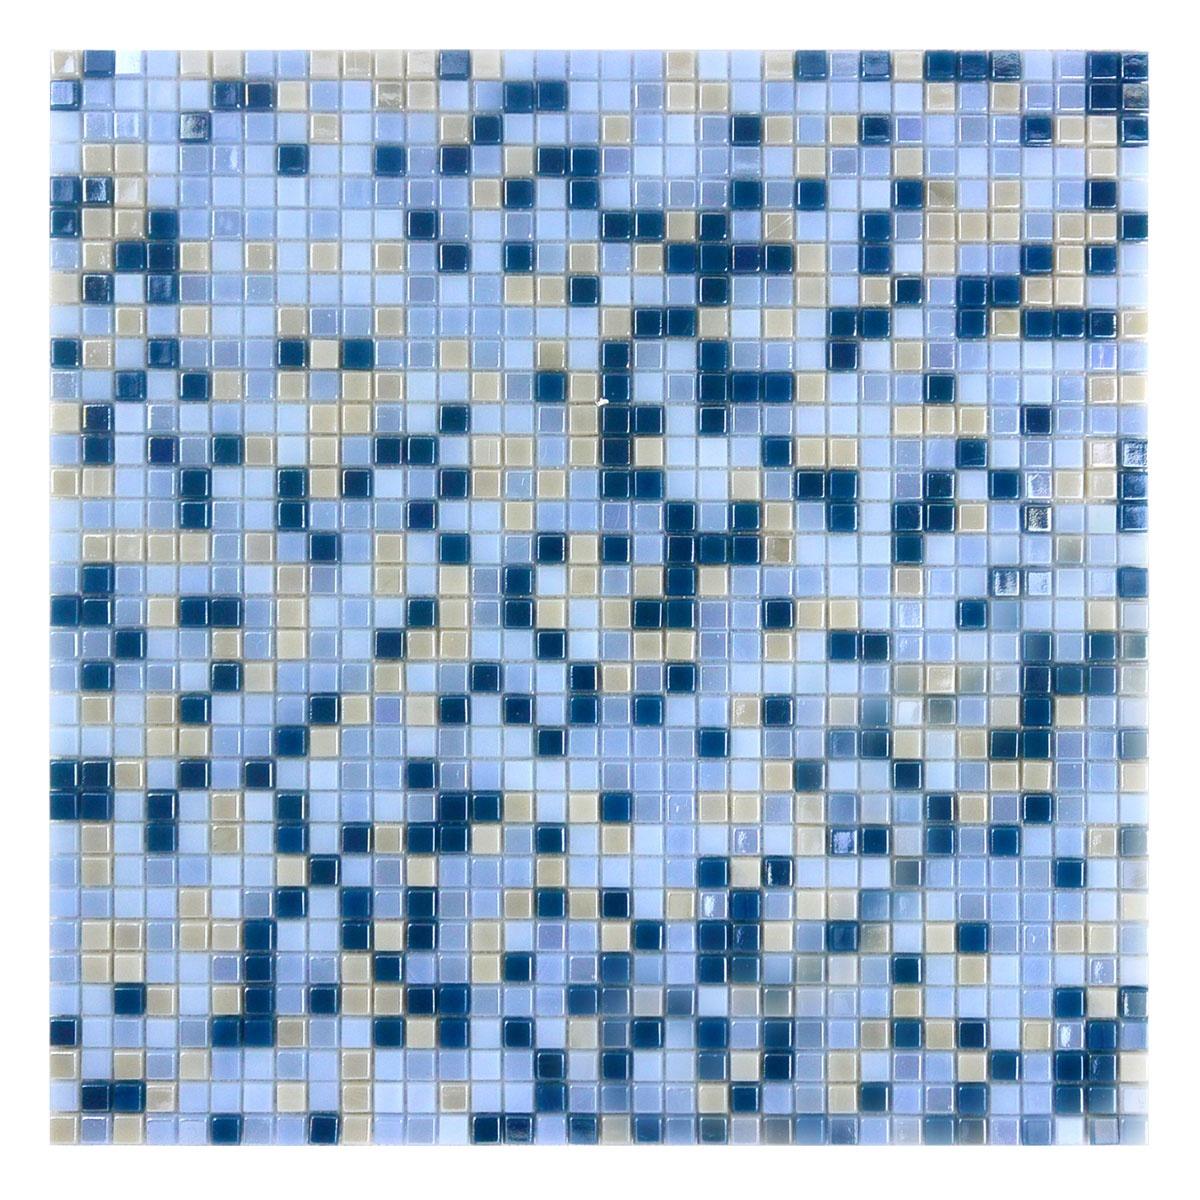 5 16 x5 16 galaxy collection pluto straight cut galaxy for 7x11 bathroom layouts